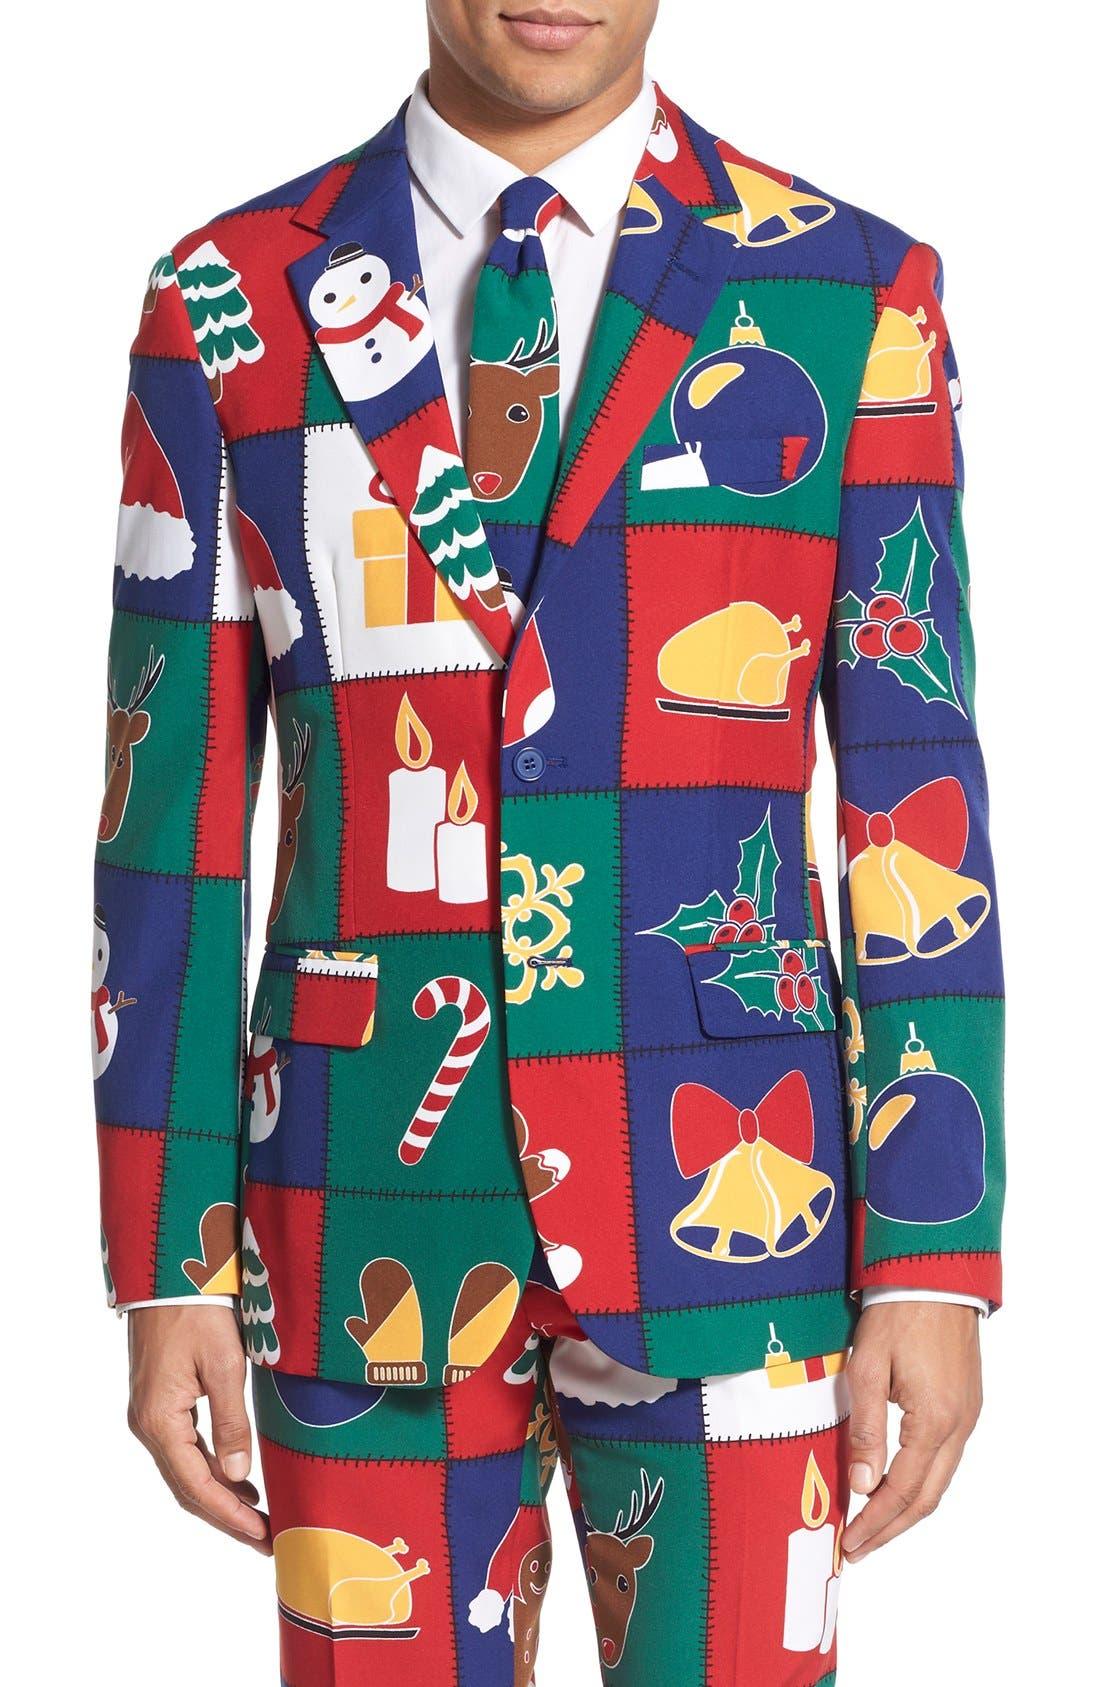 'Quilty Pleasure' Holiday Suit & Tie,                             Alternate thumbnail 2, color,                             300